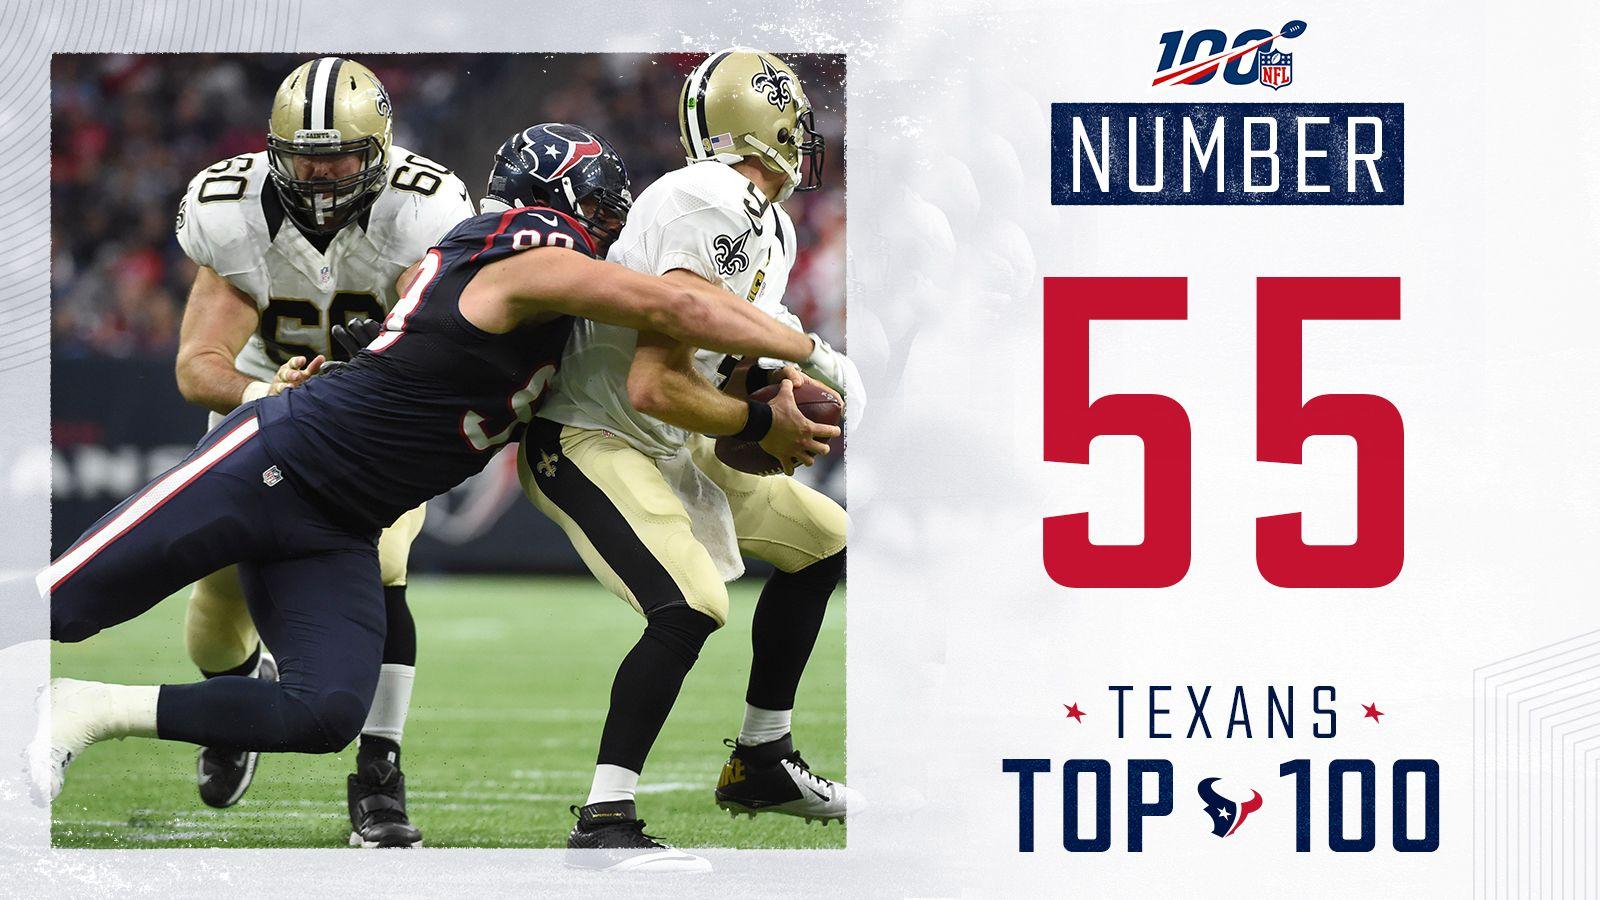 55_Texans beat Drew Brees in 2015 - TWITTER